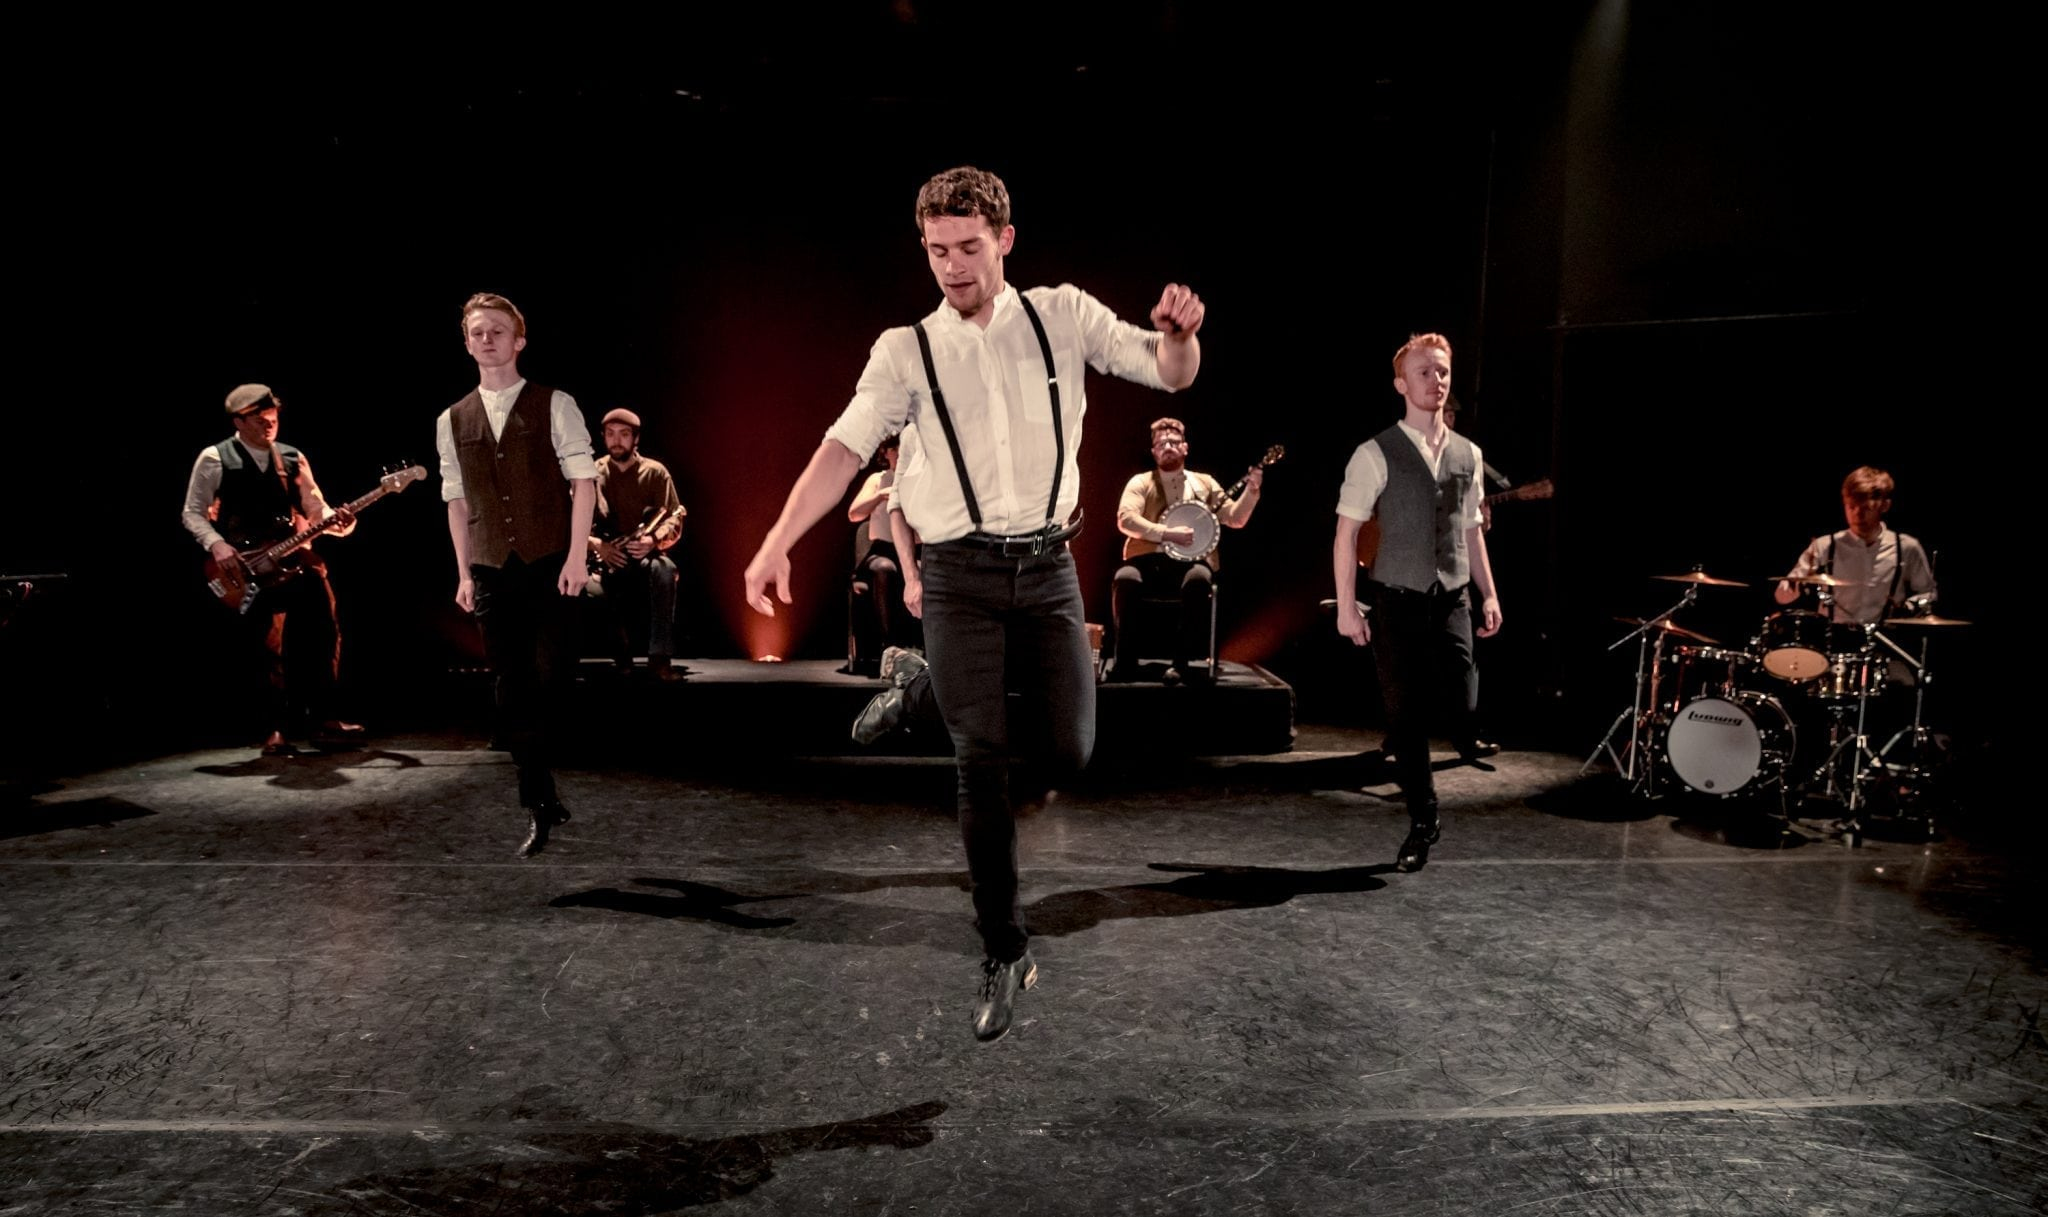 Dublin Irish Dance:Stepping Out